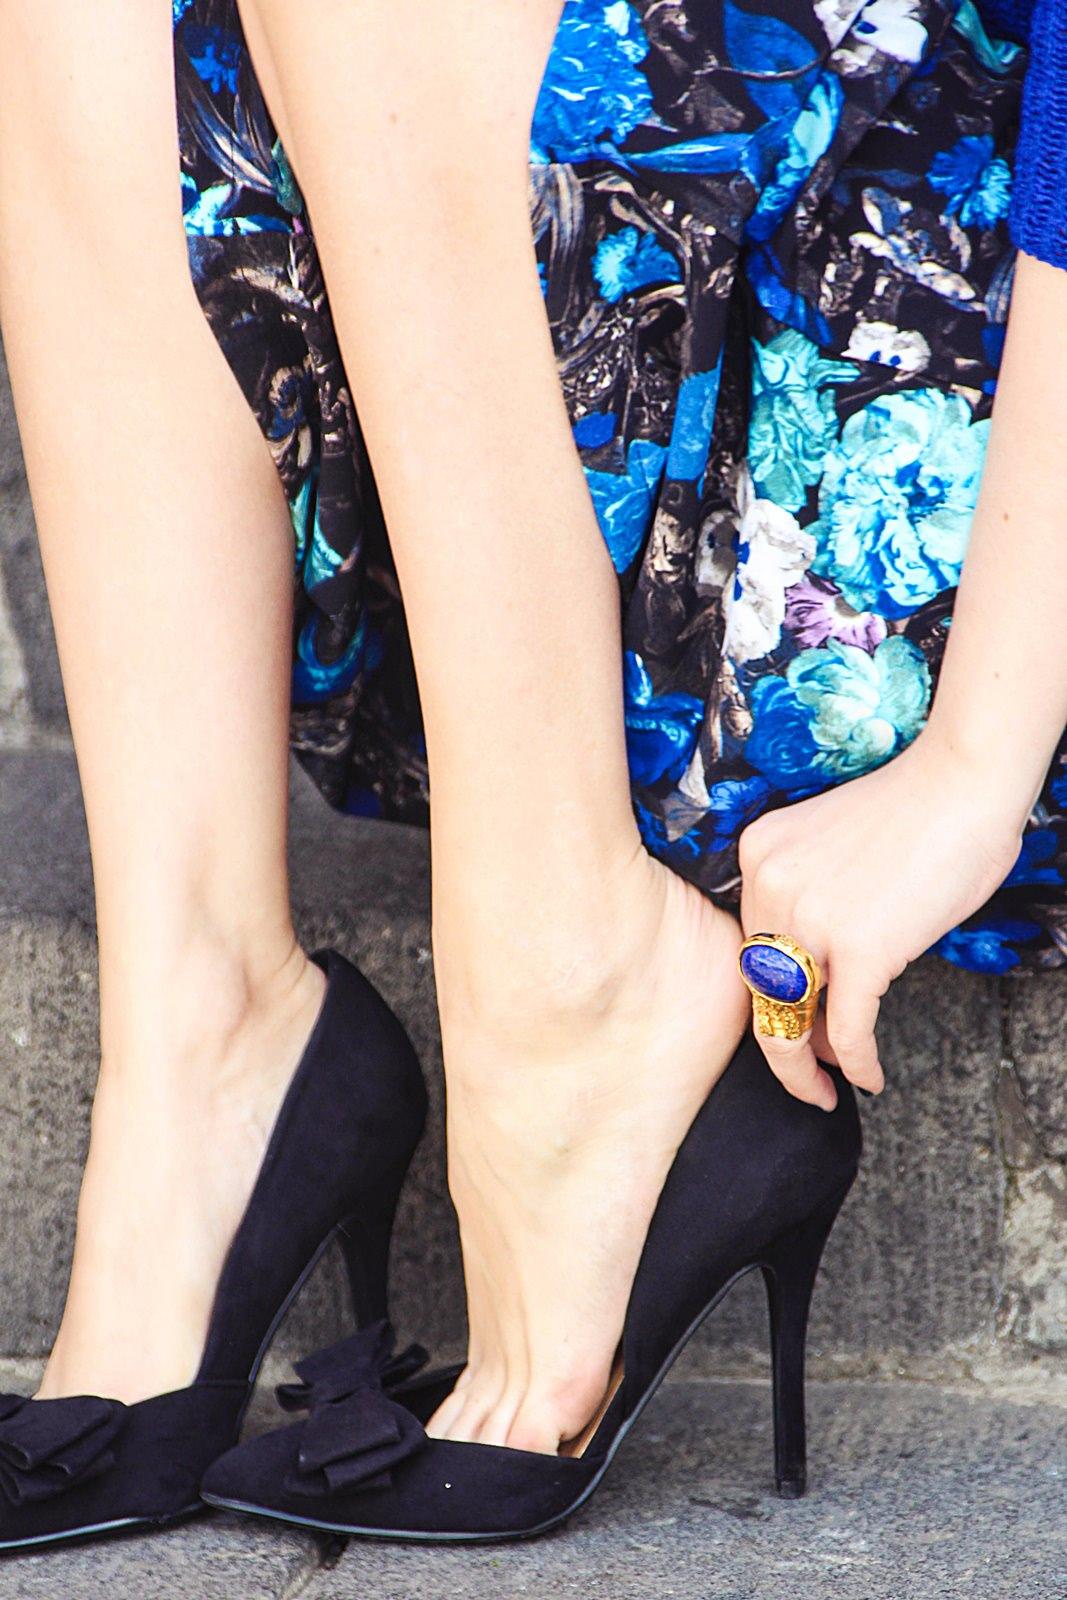 Des Belles Choses_Culotte_Floral Spring Trend 11